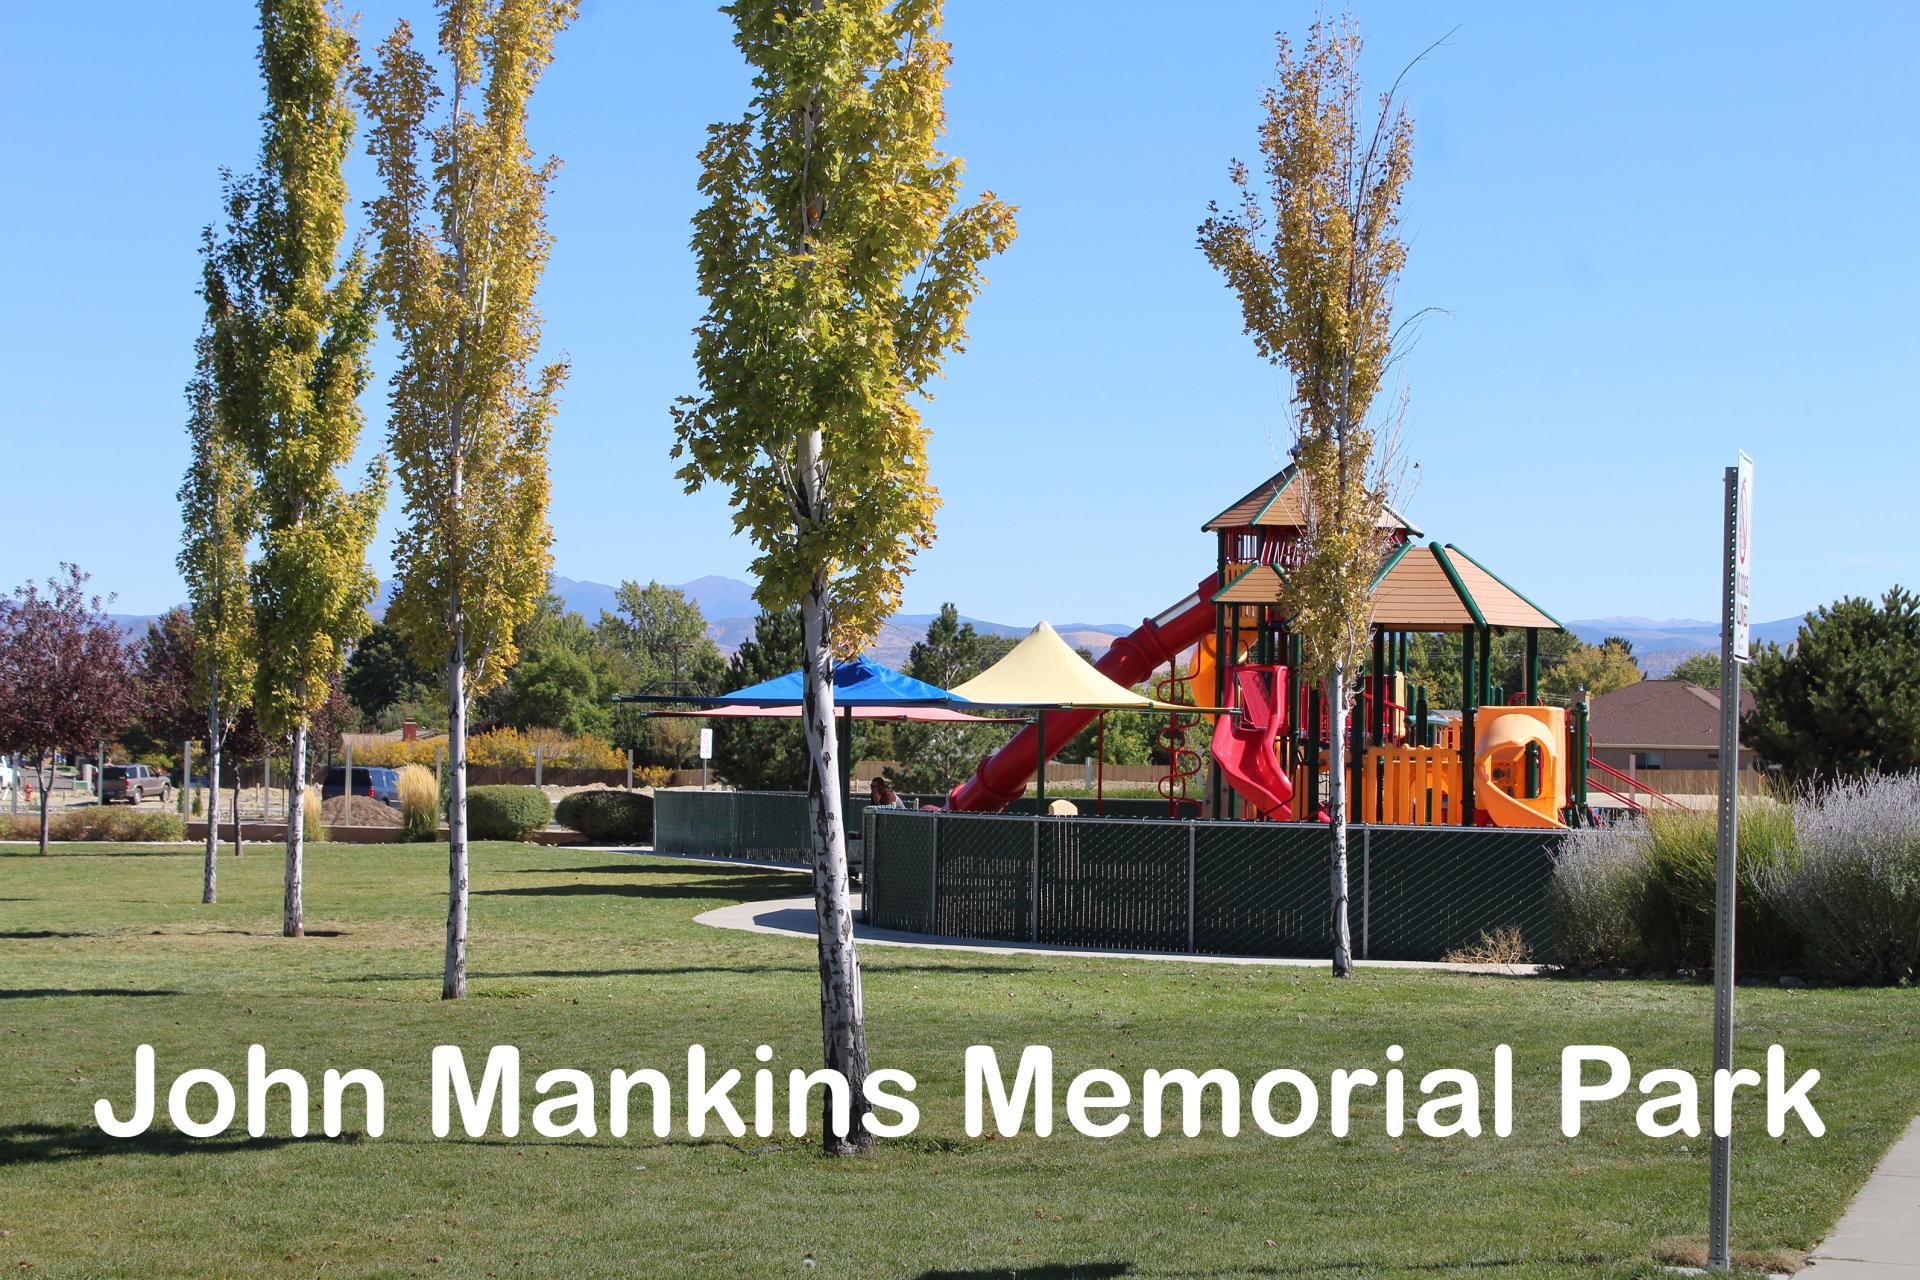 Mankins Playground